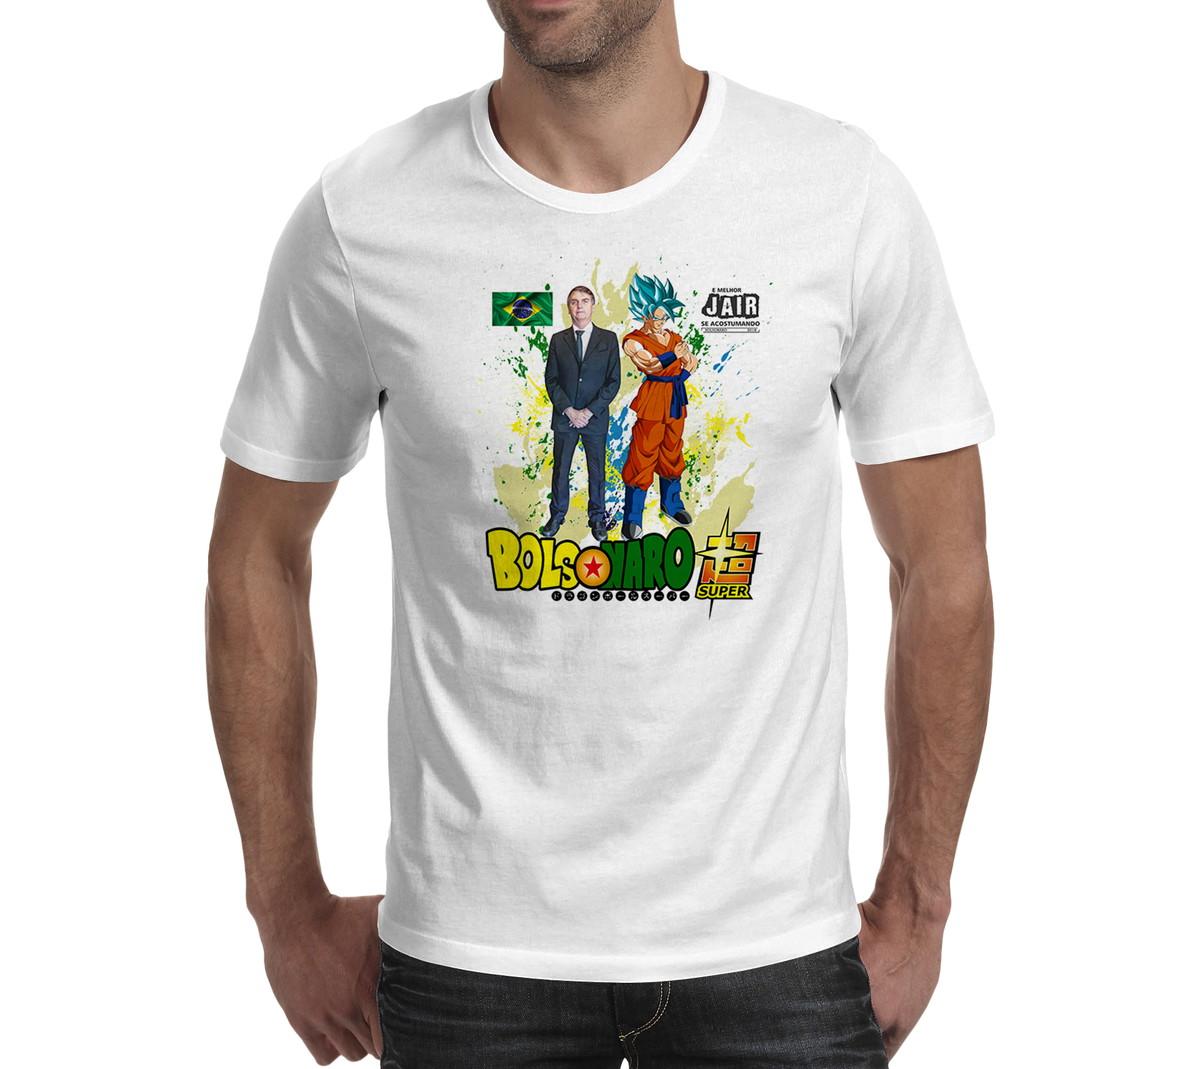 Camisa Camiseta Jair Bolsonaro Presidente 2018 Goku no Elo7  6ebfa002cc4c8